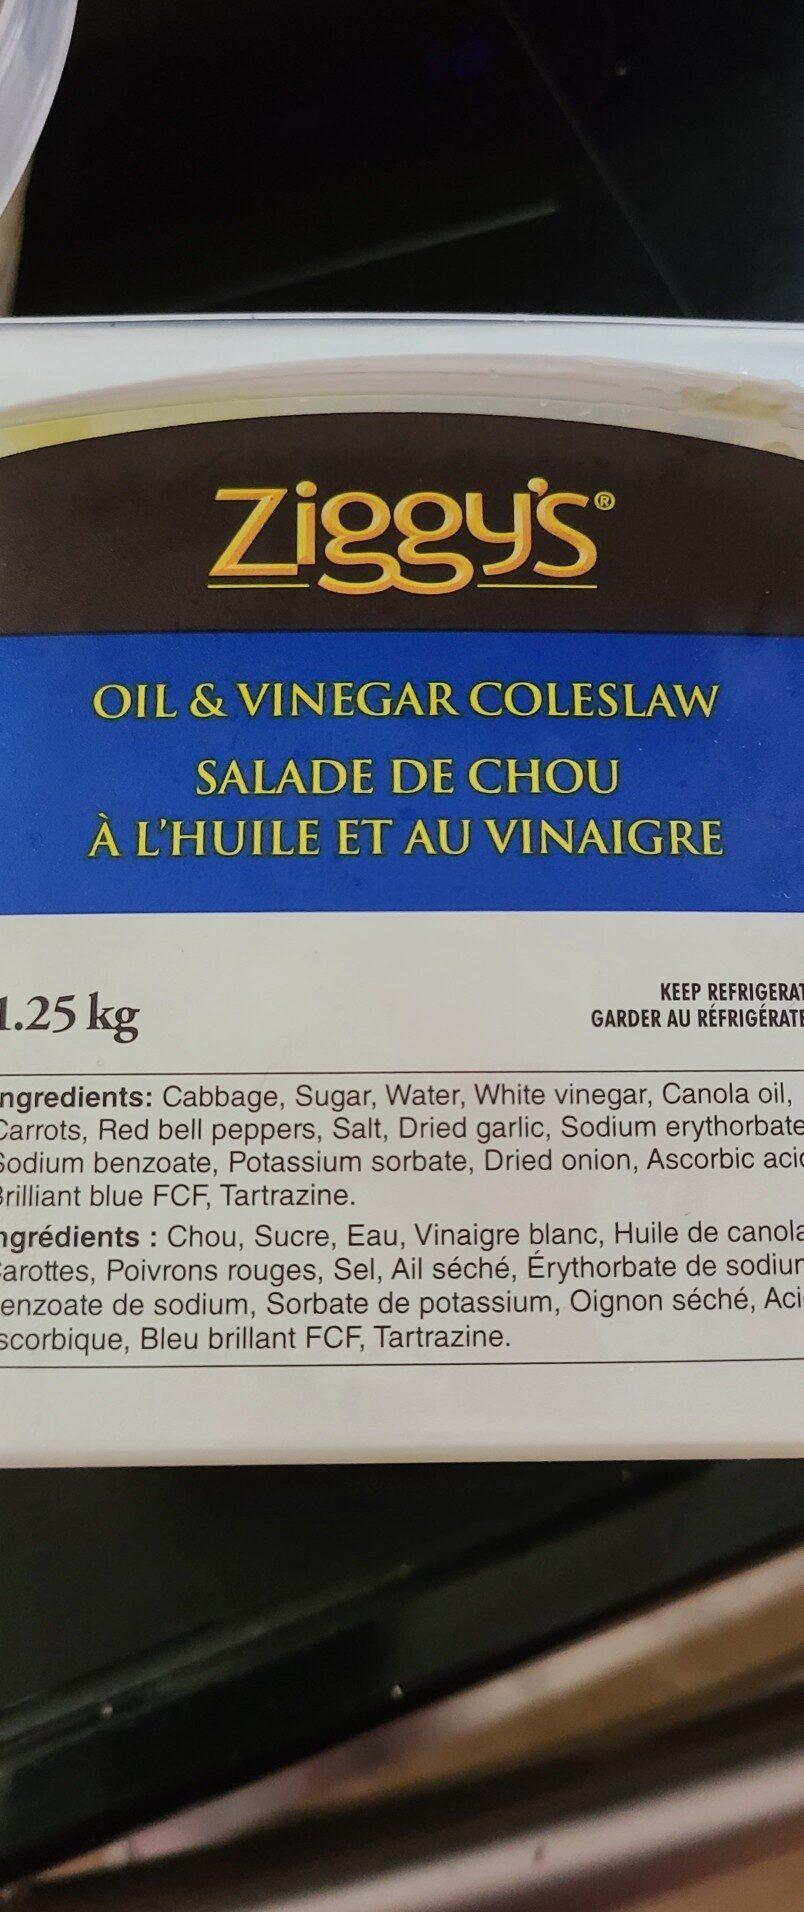 ziggys oil and vinegar coleslaw - Ingrédients - en